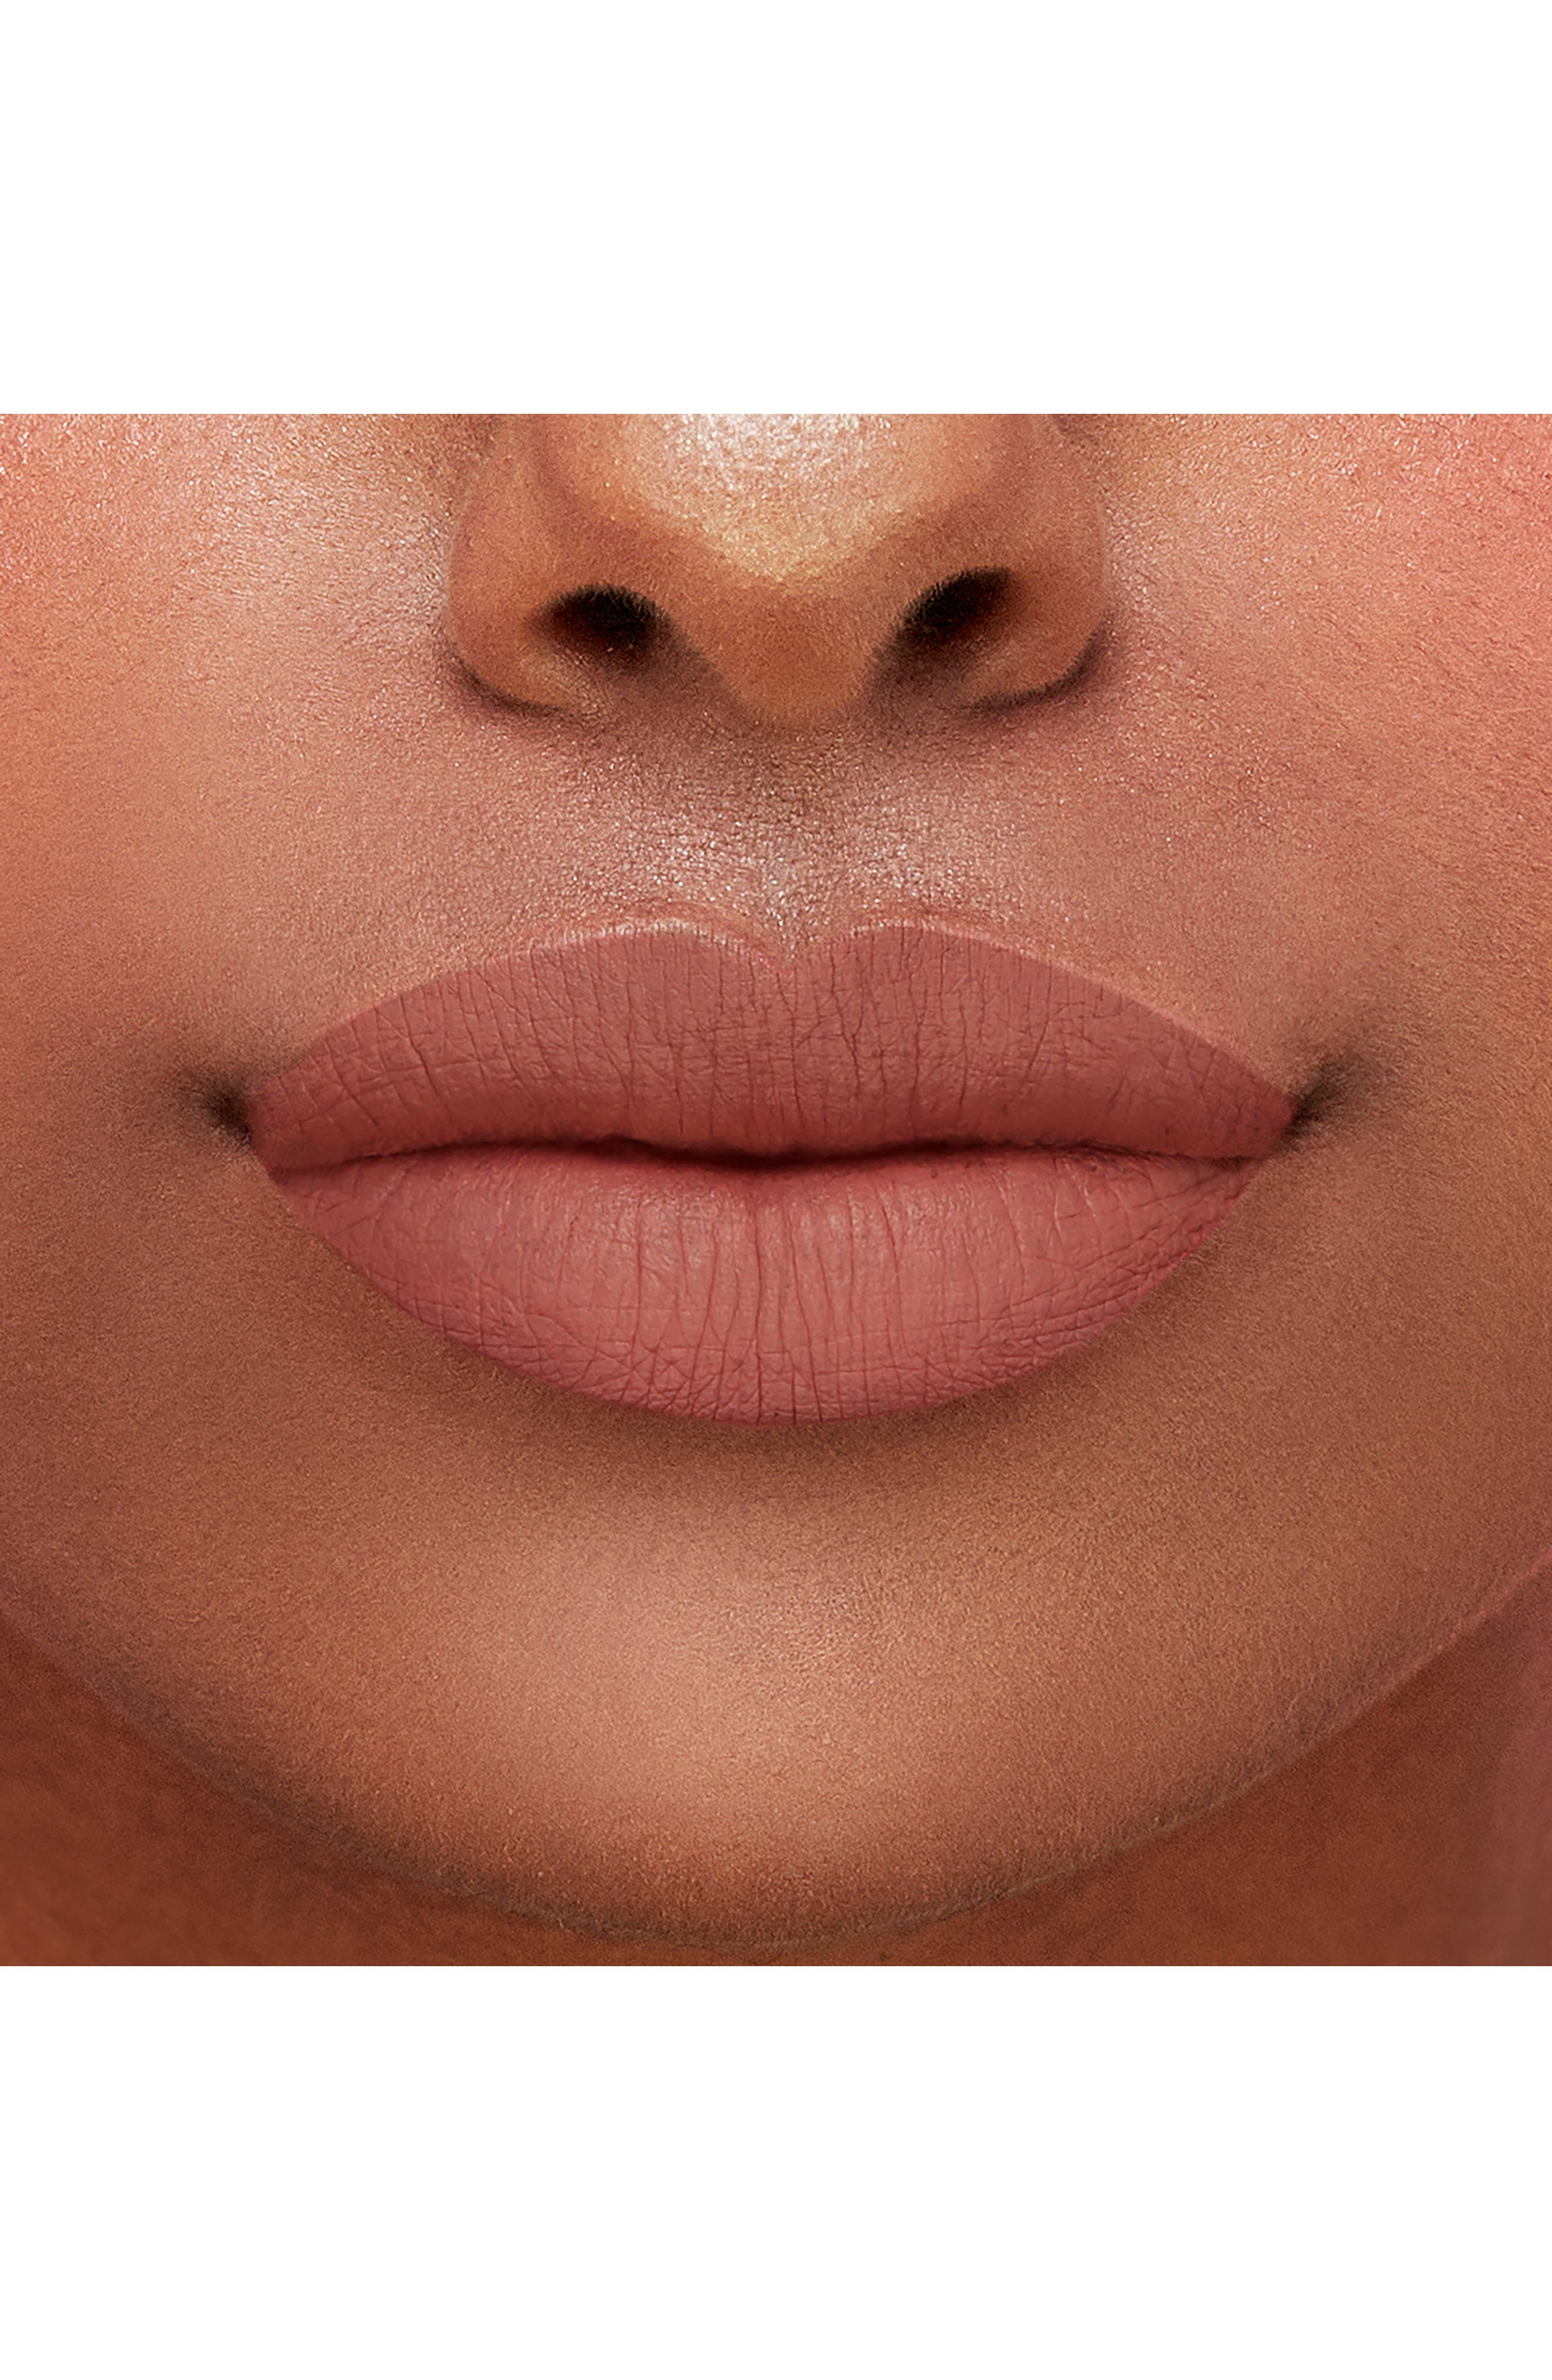 KARL LAGERFELD + MODELCO Kiss Me Karl Lip Lights Lipstick,                             Alternate thumbnail 7, color,                             200